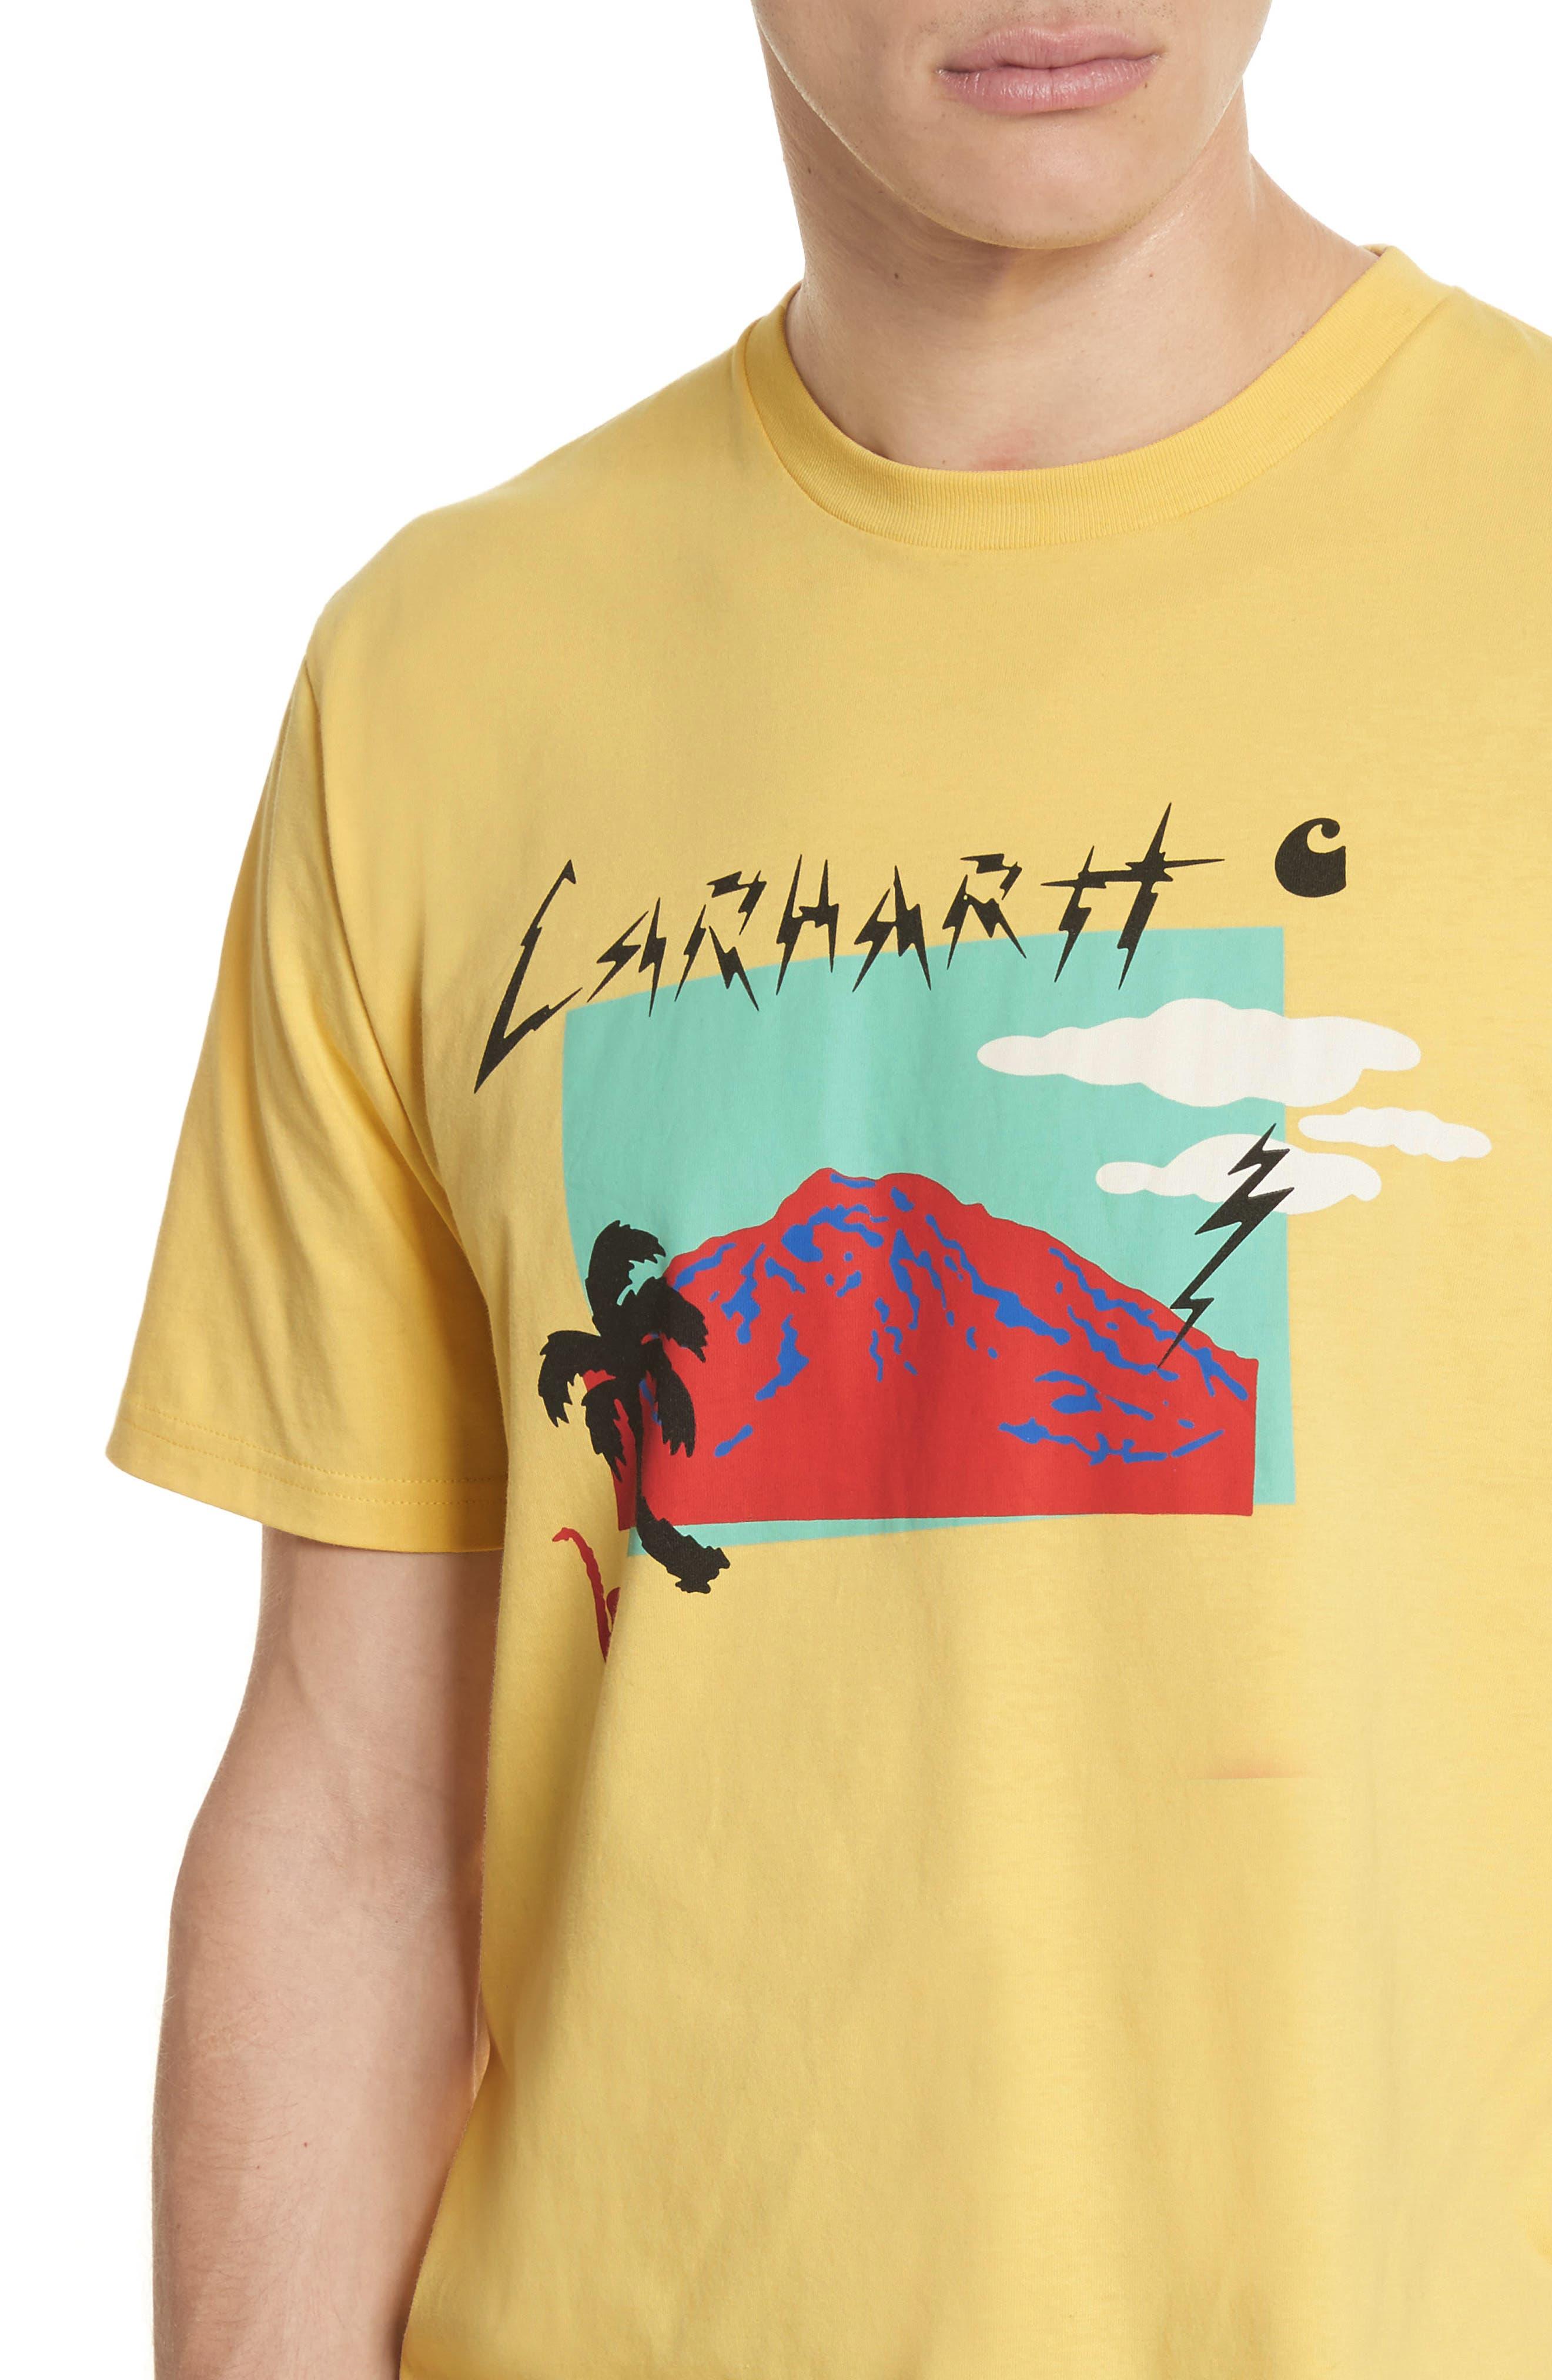 Anderson T-Shirt,                             Alternate thumbnail 4, color,                             Citrine